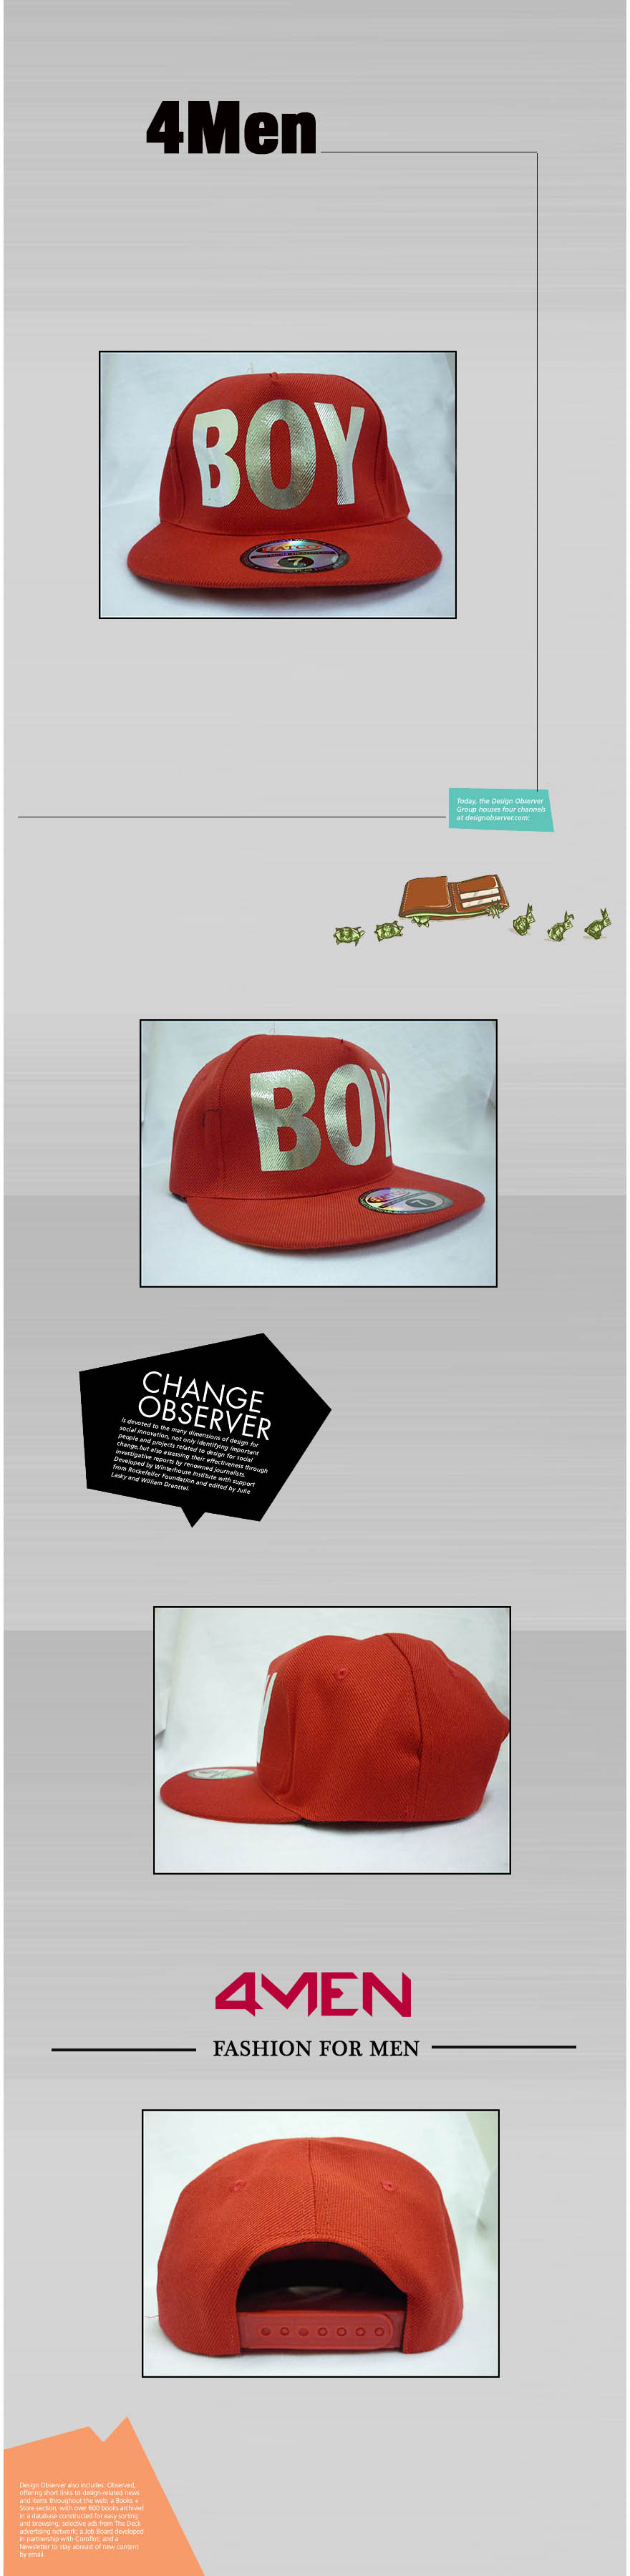 Nón hiphop boy đỏ đô nf017 - 1